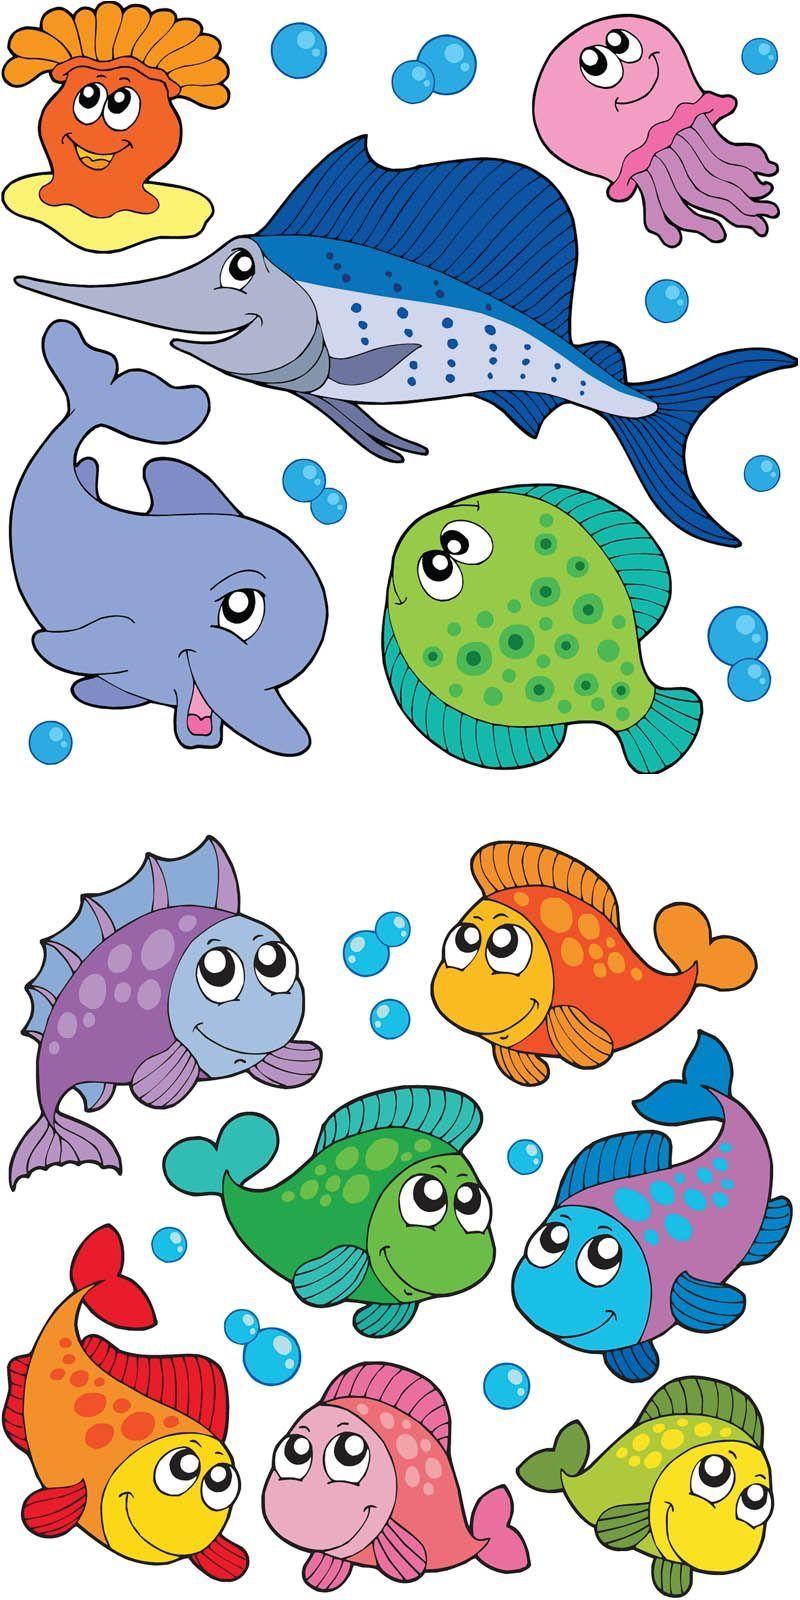 Pin By Vicky V On Party Print Cartoon Fish Fish Clipart Clip Art